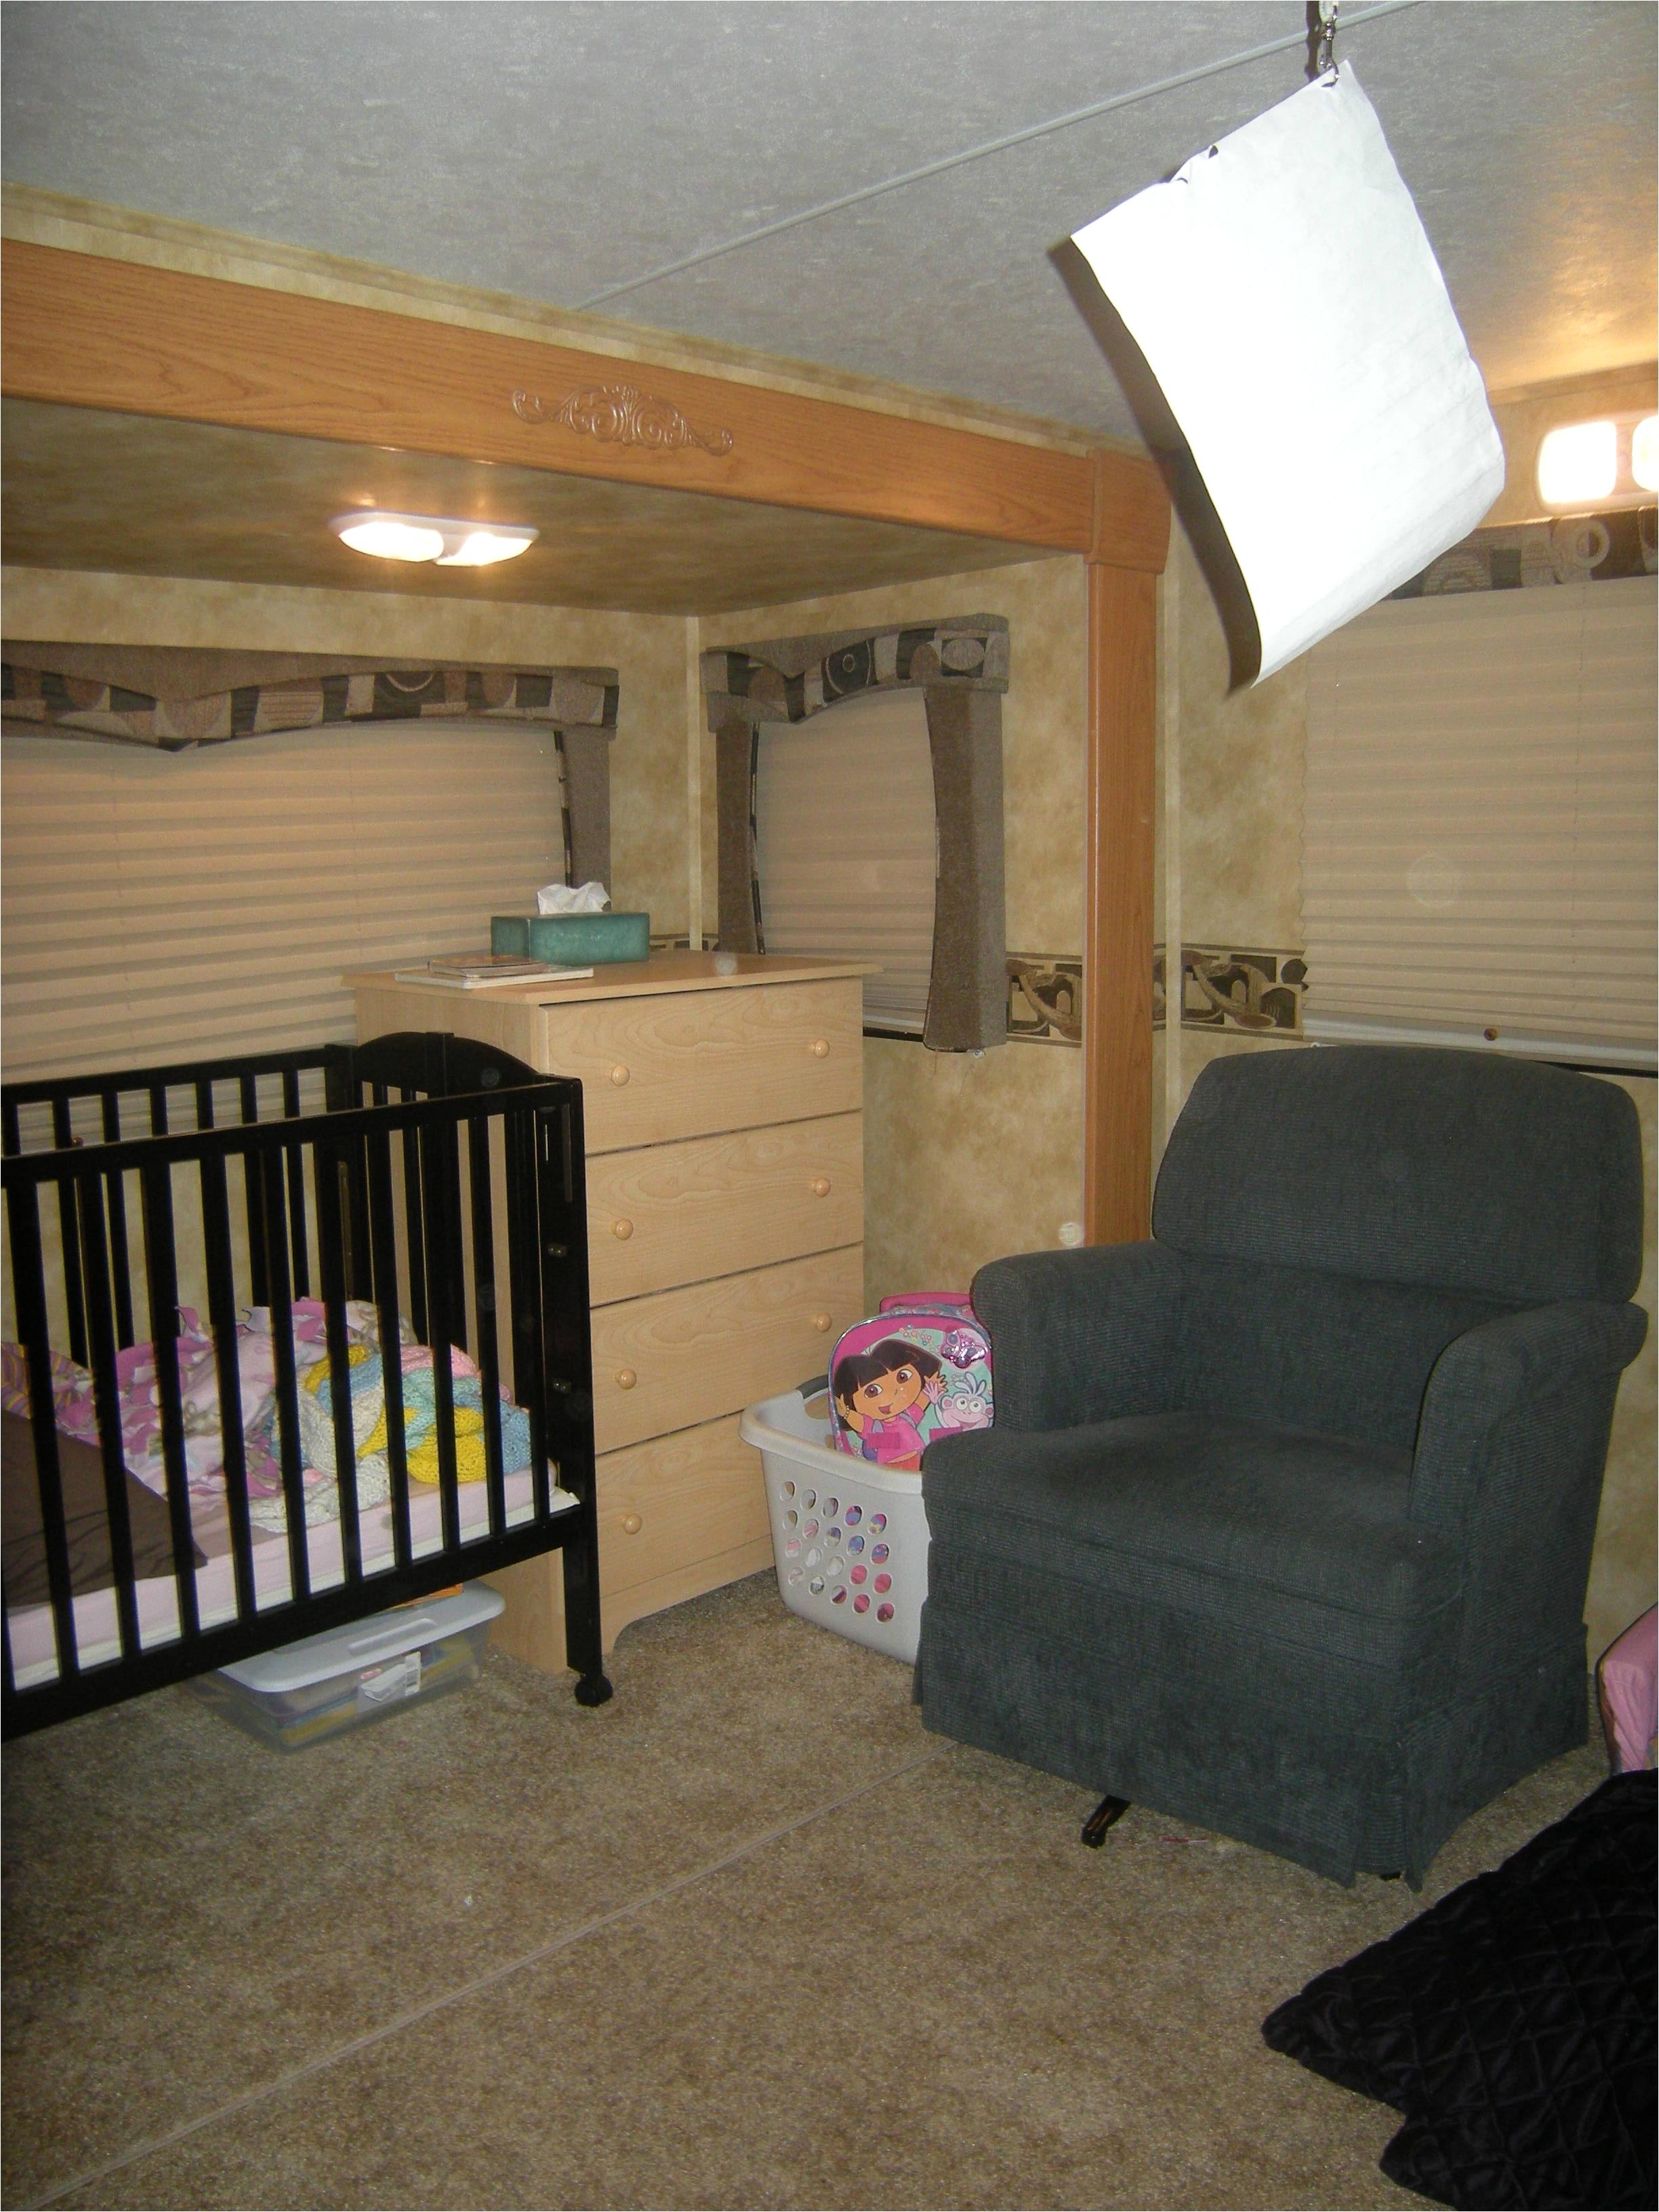 2 bedroom 5th wheel lovely 3 bedroom fifth wheel home design ideas ikea duckdns